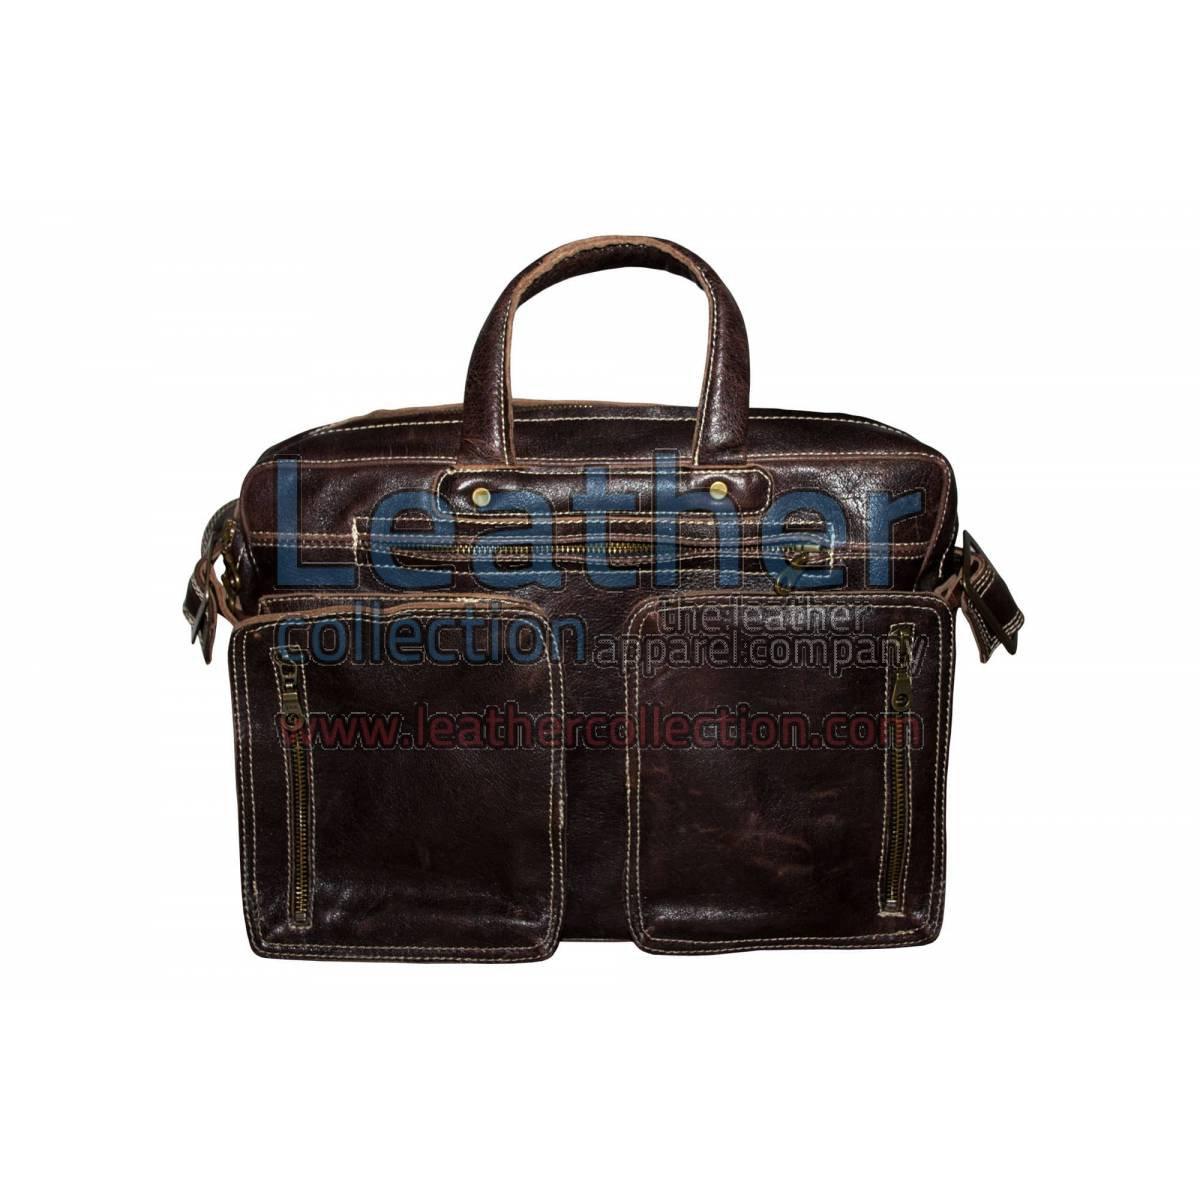 Retro Leather Laptop Bag